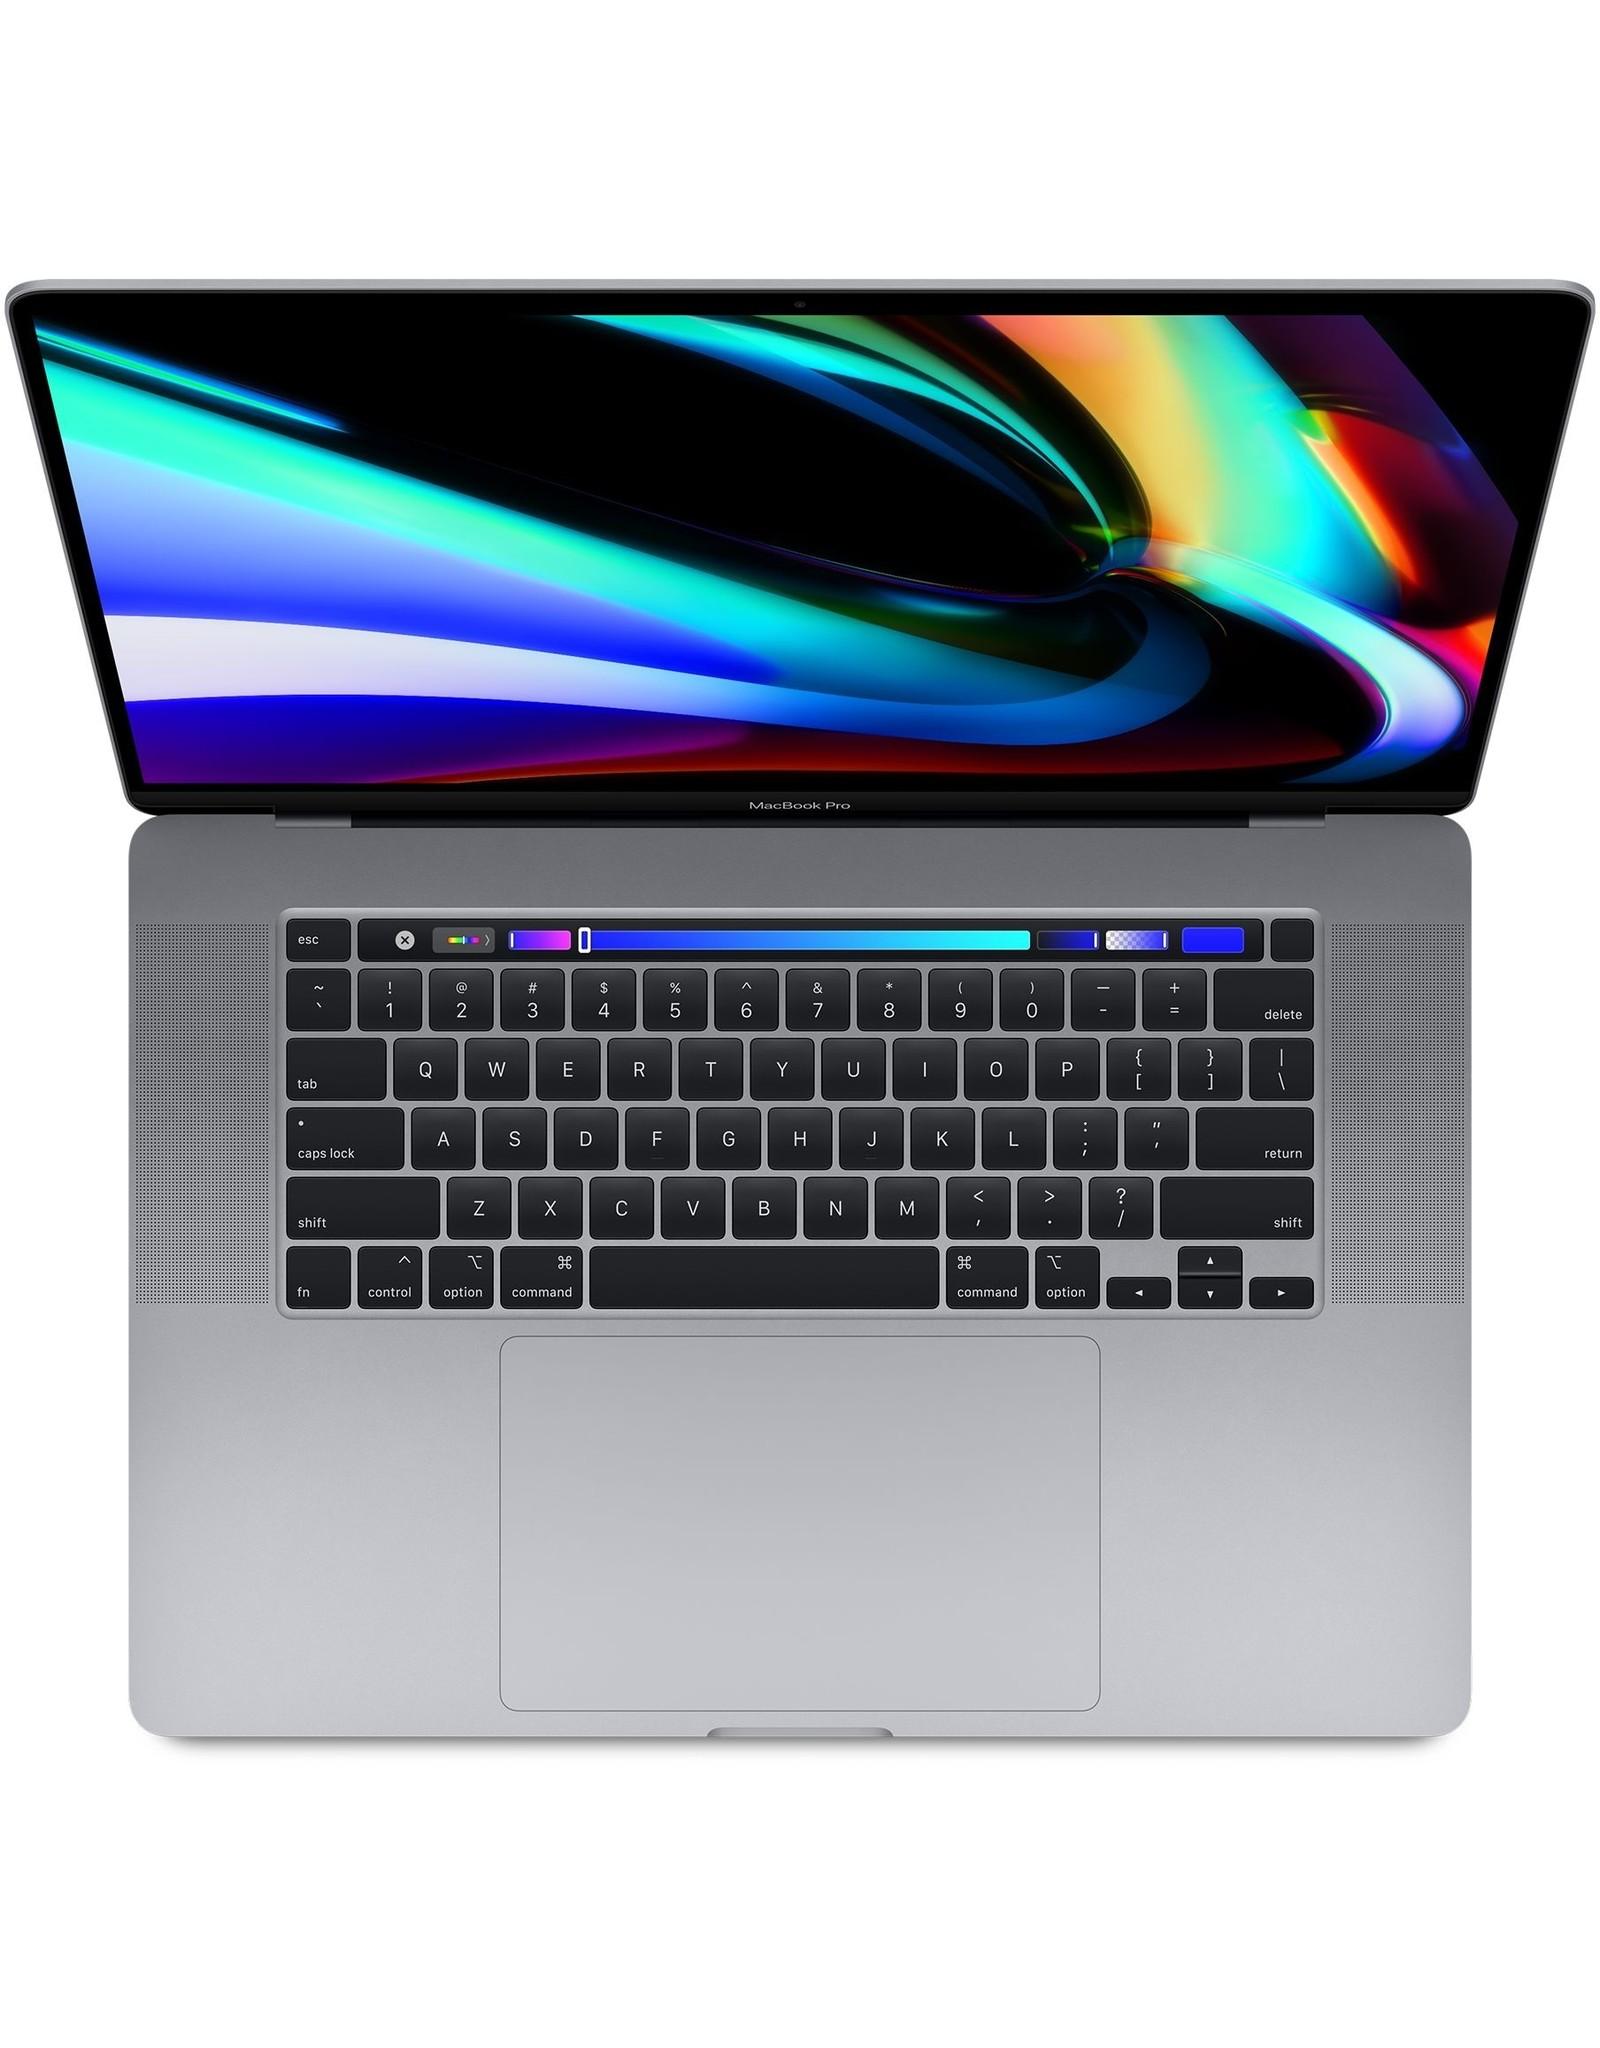 Apple MacBook Pro 13 256gb GREY 2.4GHz 4-core 8th-gen Intel i5